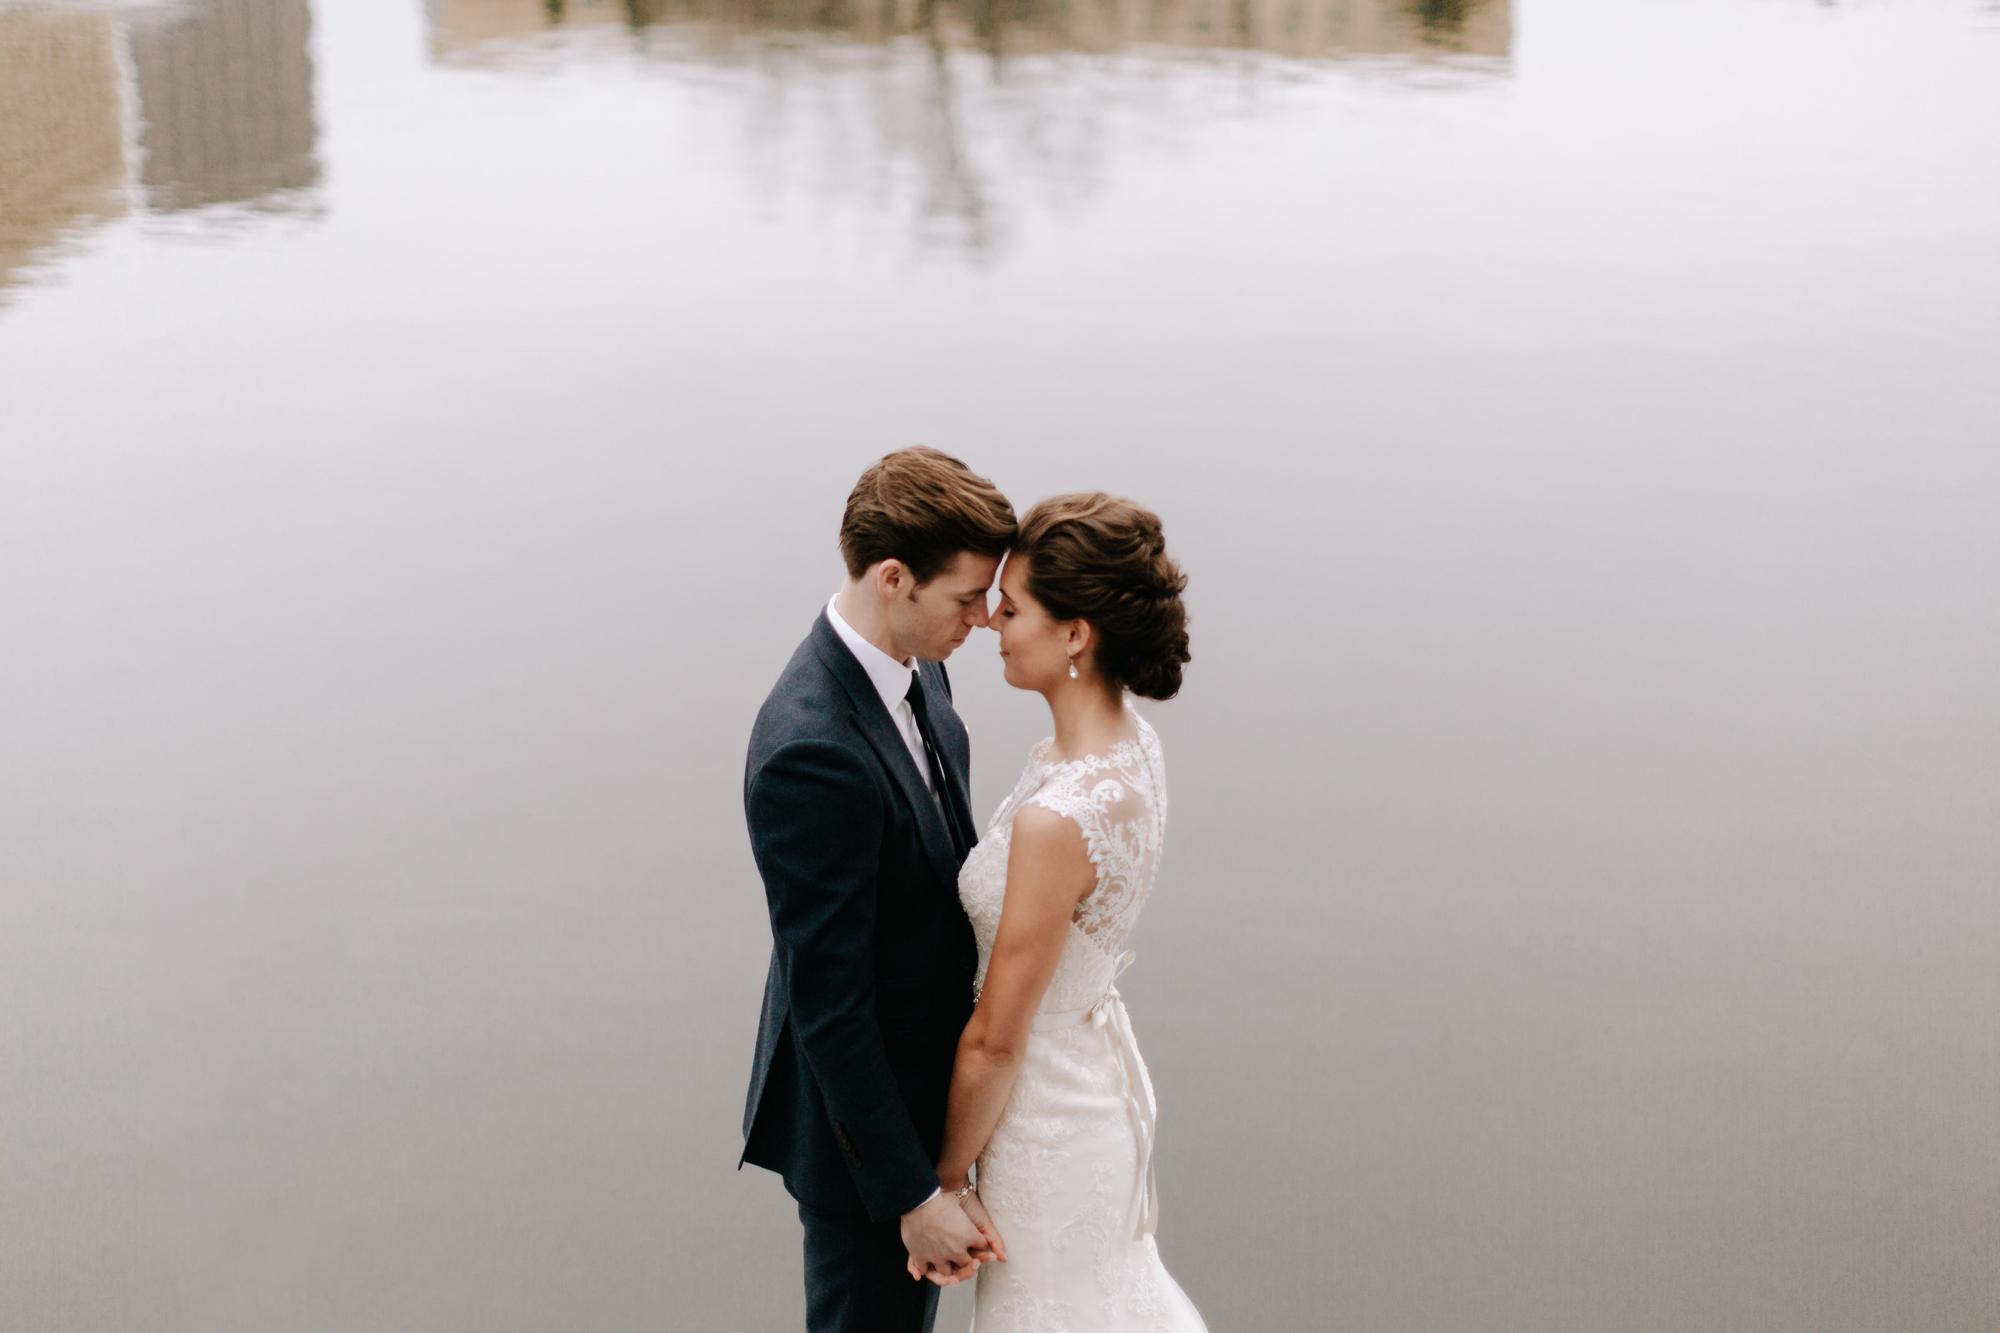 Nicollet-Island-Pavilion-Winter-Wedding-Minneapolis_20.jpg